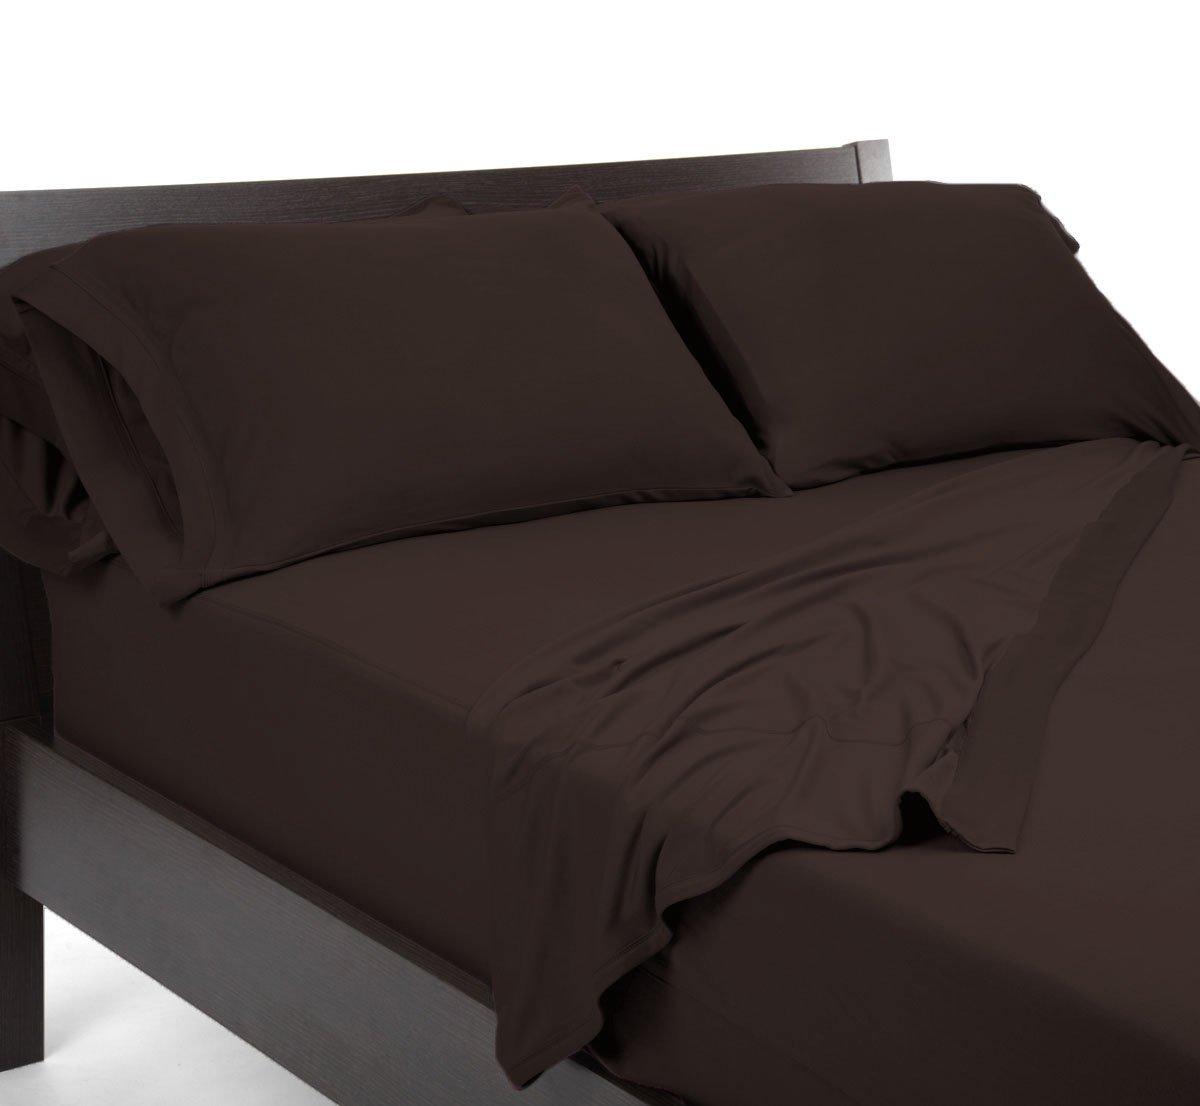 SHEEX REVERSIBLE Pillowcase, Brown (Standard)